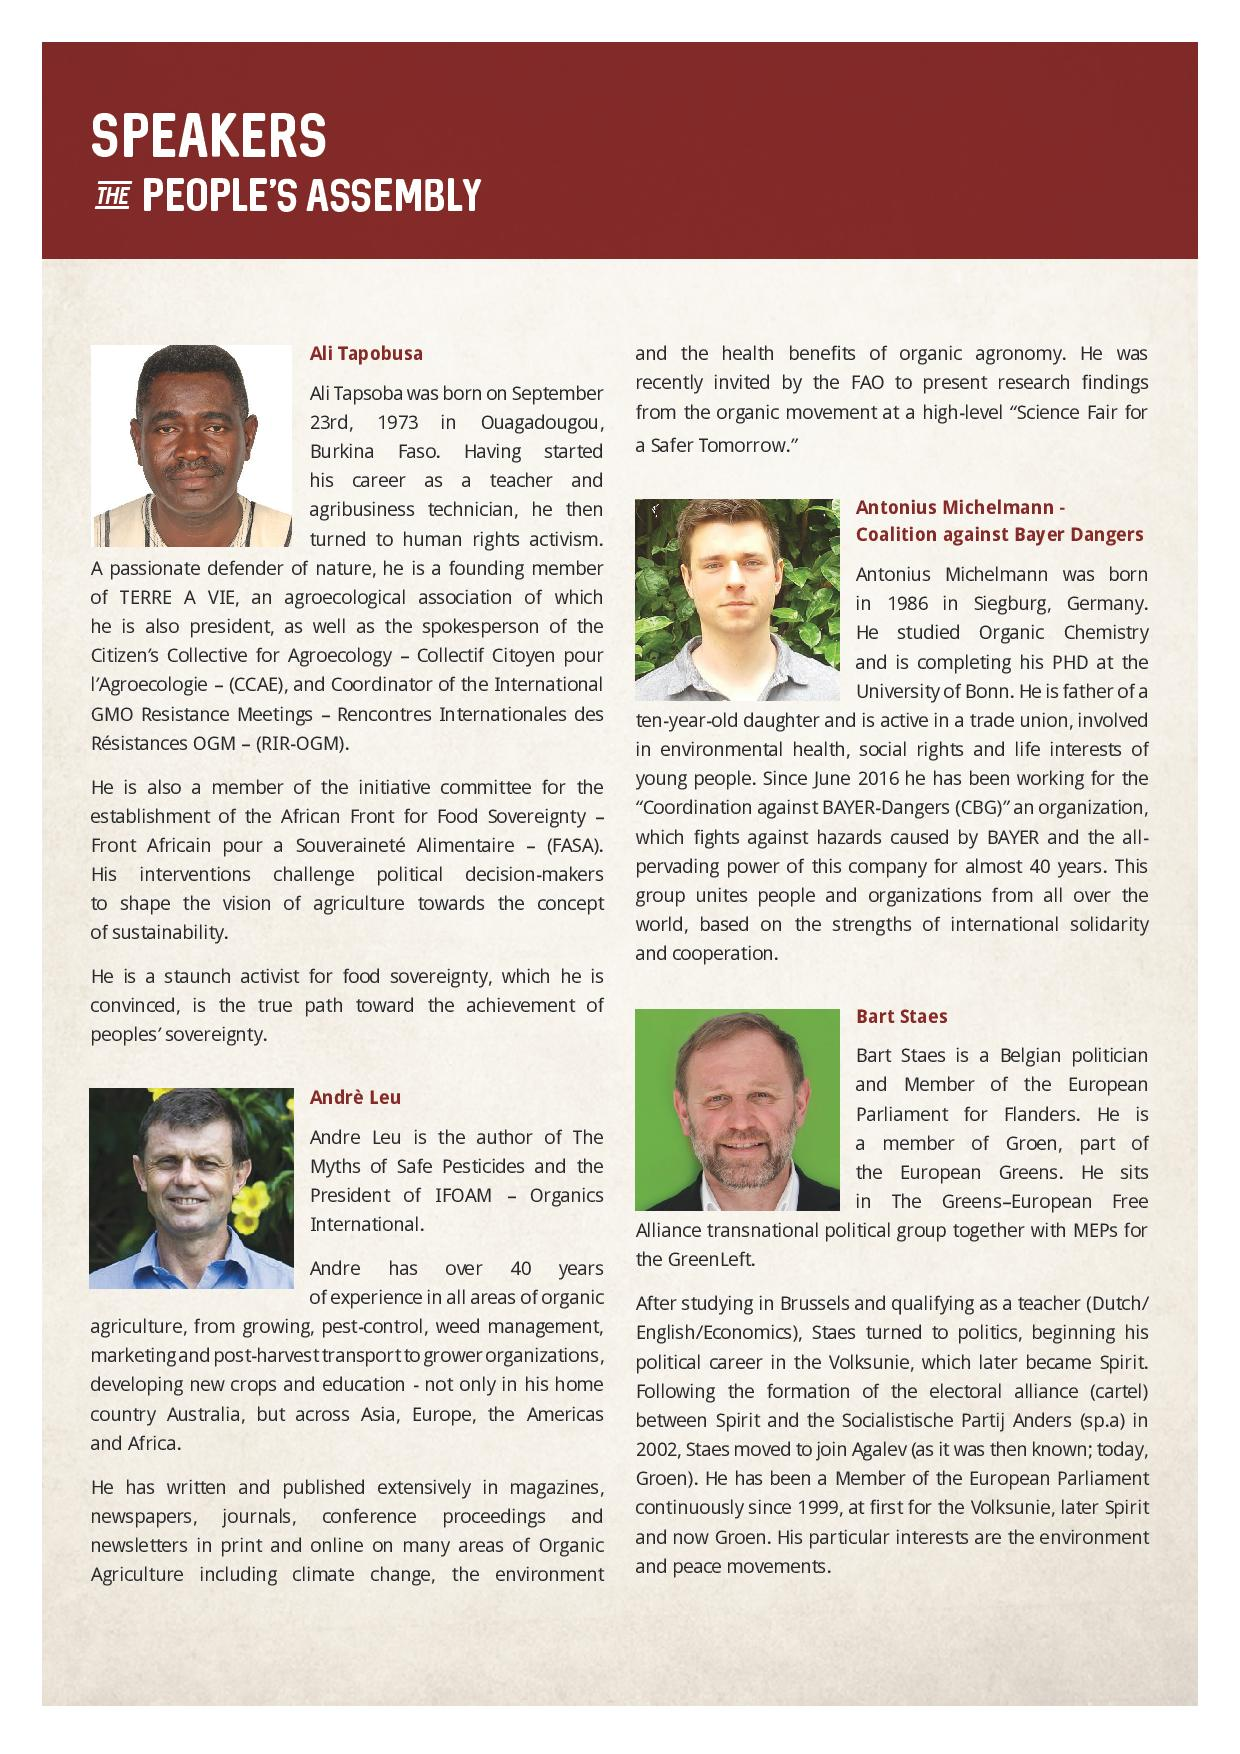 pa_speaker_bios-page-001